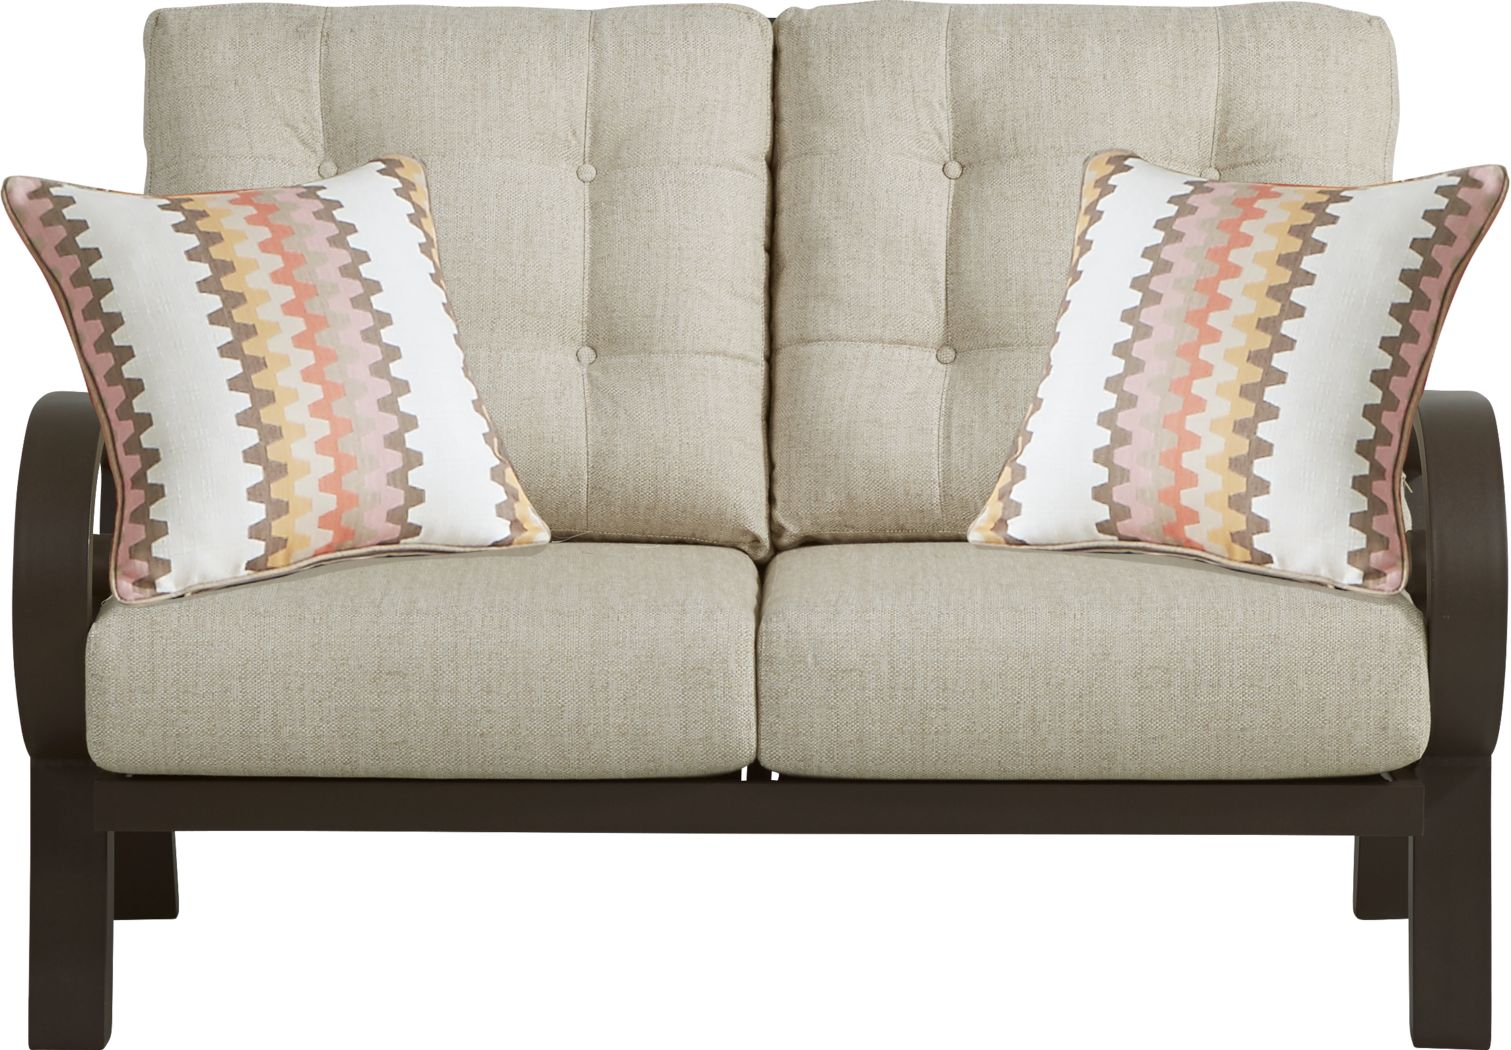 Bermuda Bay Aged Bronze Outdoor Loveseat with Wren Cushions